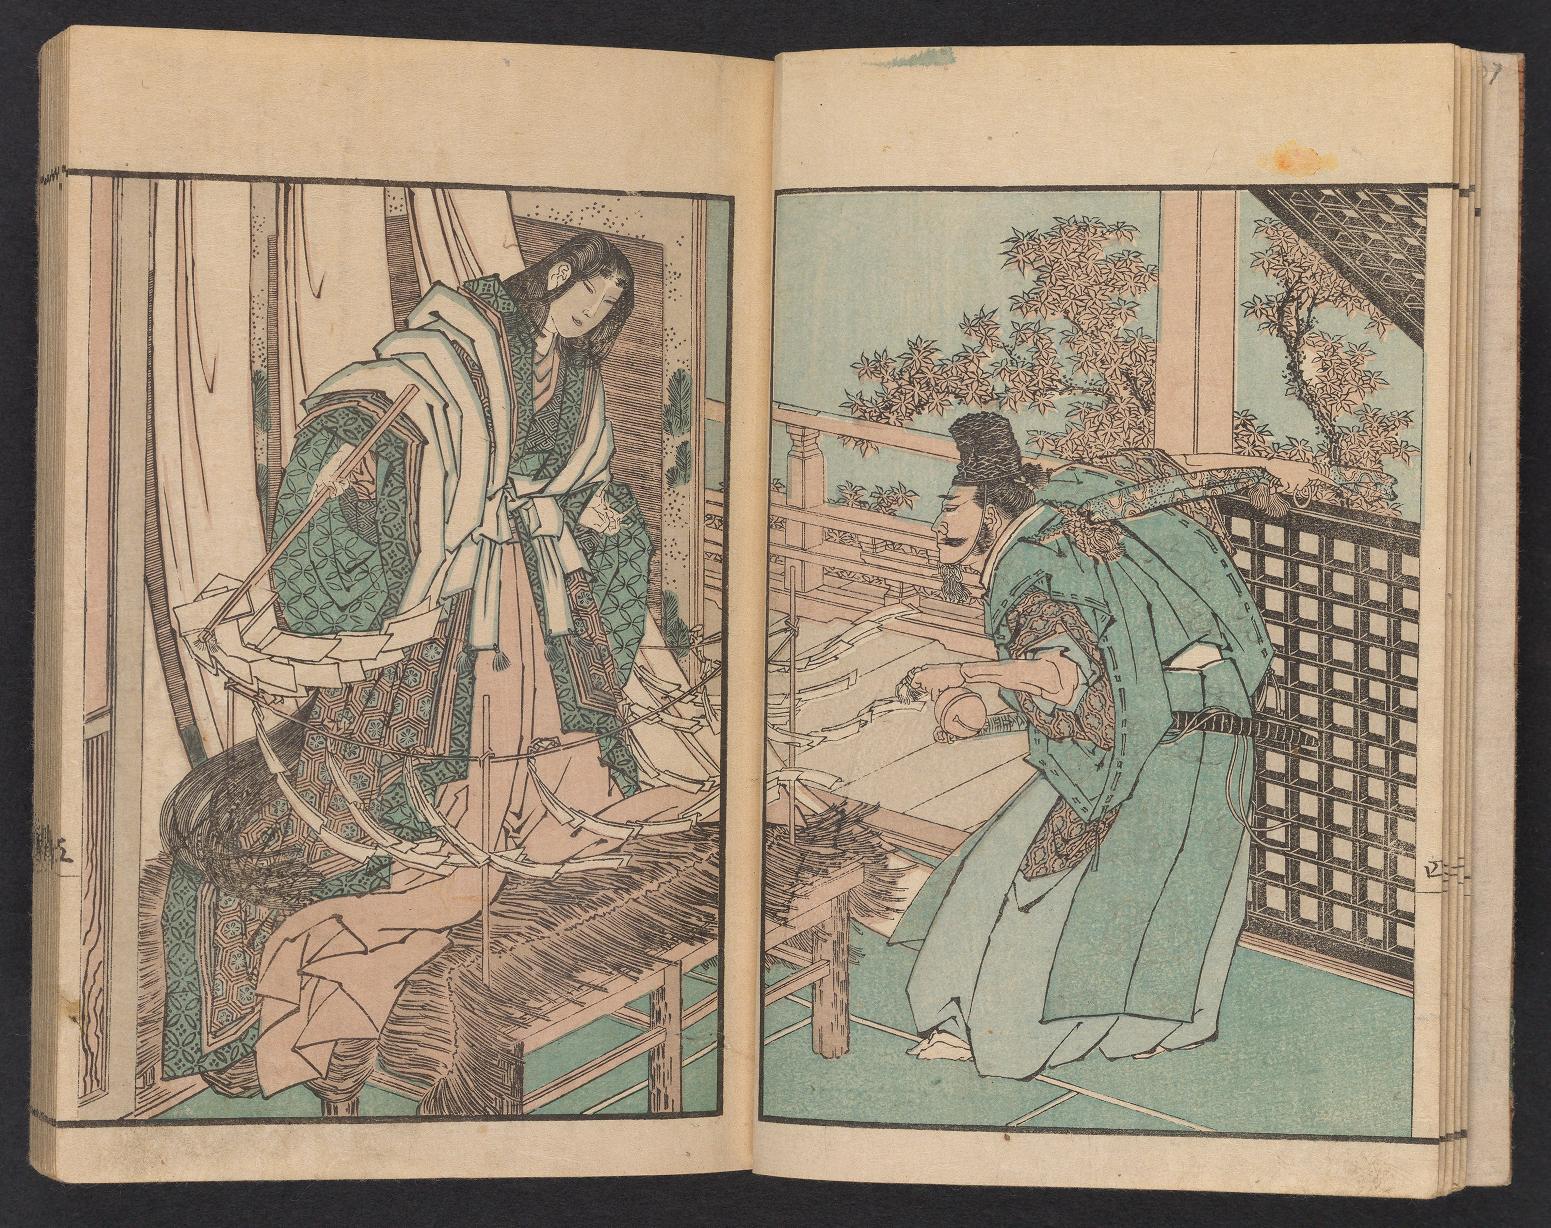 libri-illustrati-giapponesi-smithsonian-03